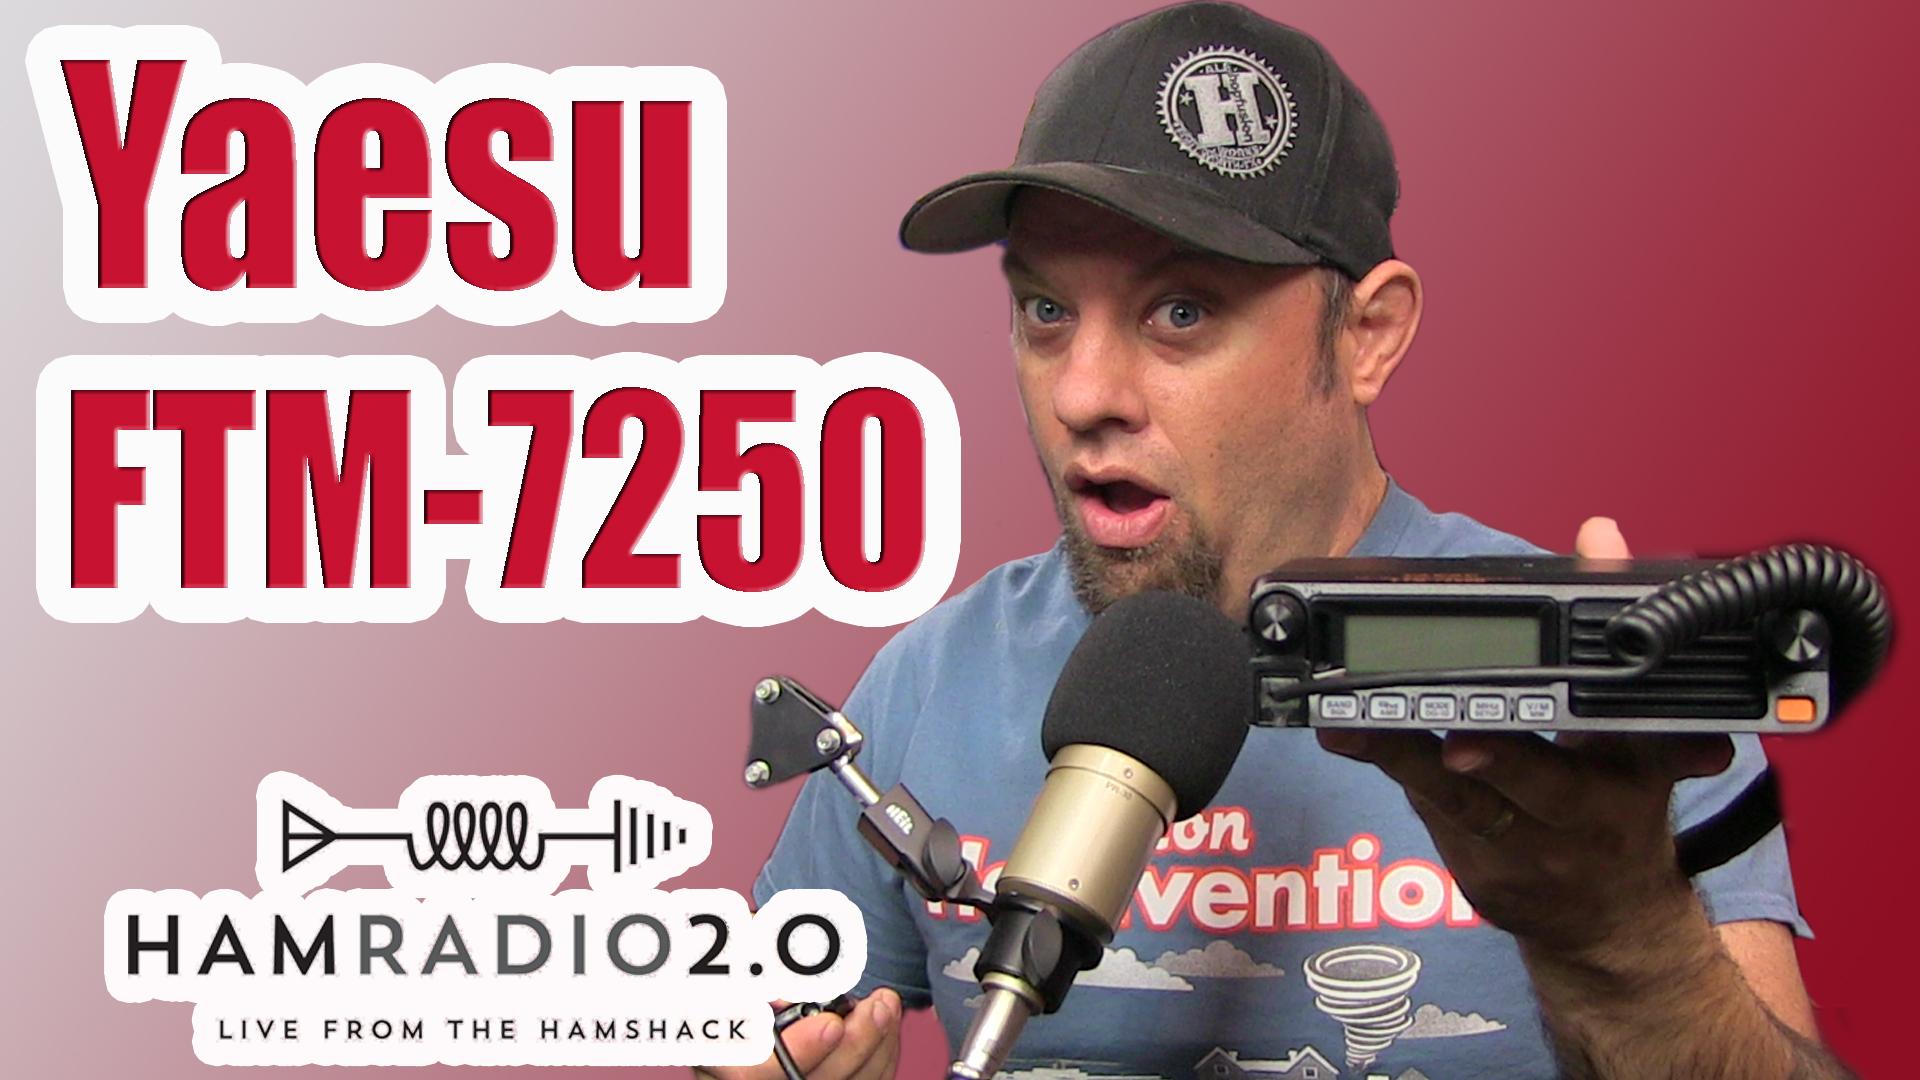 Episode 232: Yaesu FTM-7250DR System Fusion Mobile Radio Review